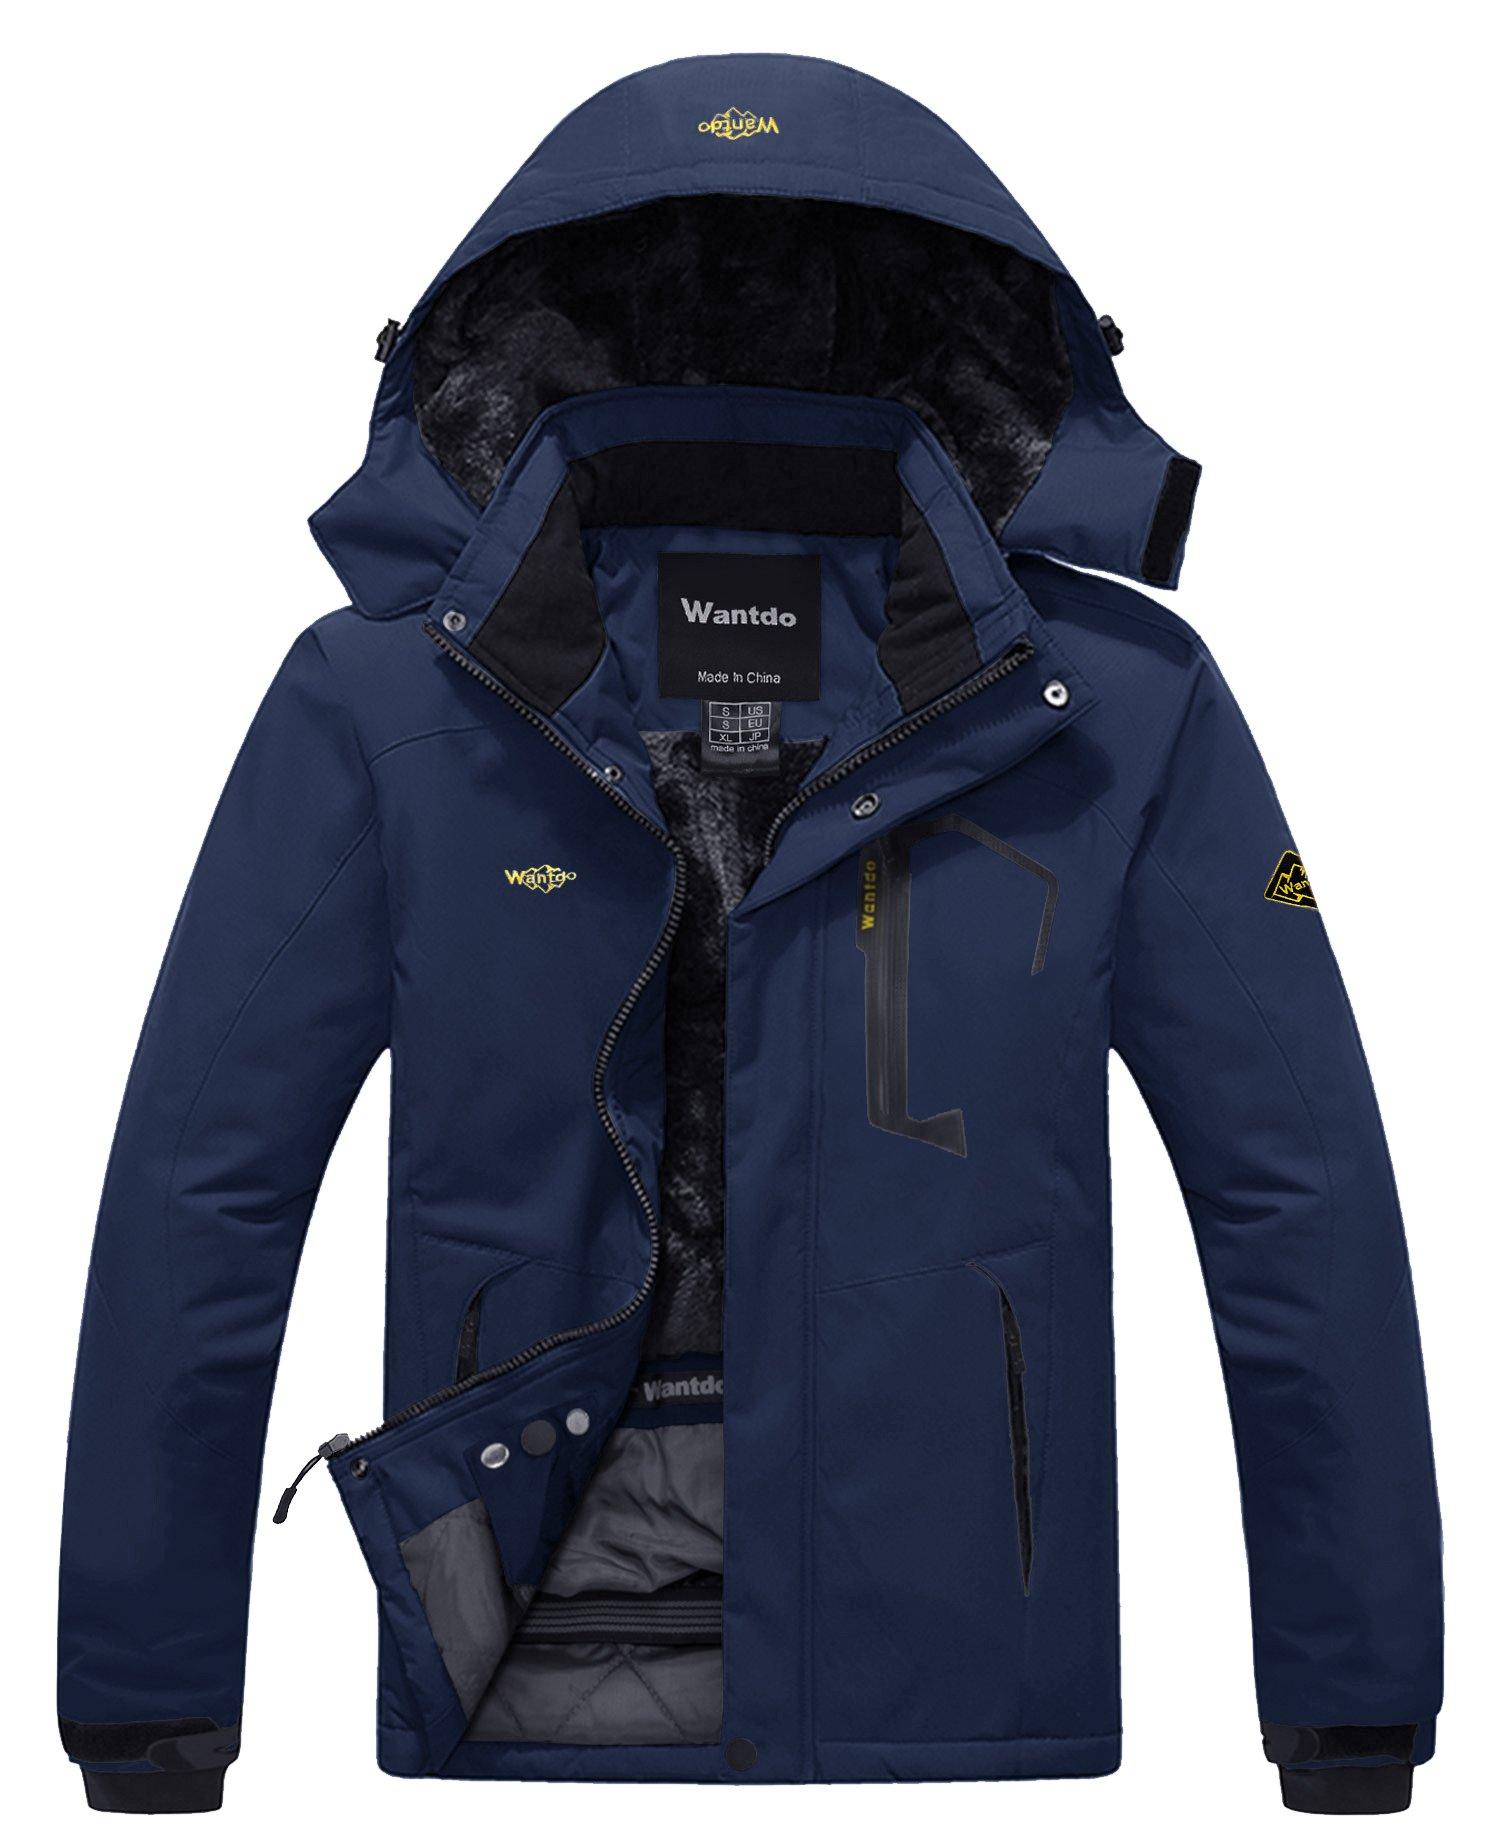 Wantdo Men's Waterproof Fleece Ski Jacket Windproof Rain Jacket Navy S